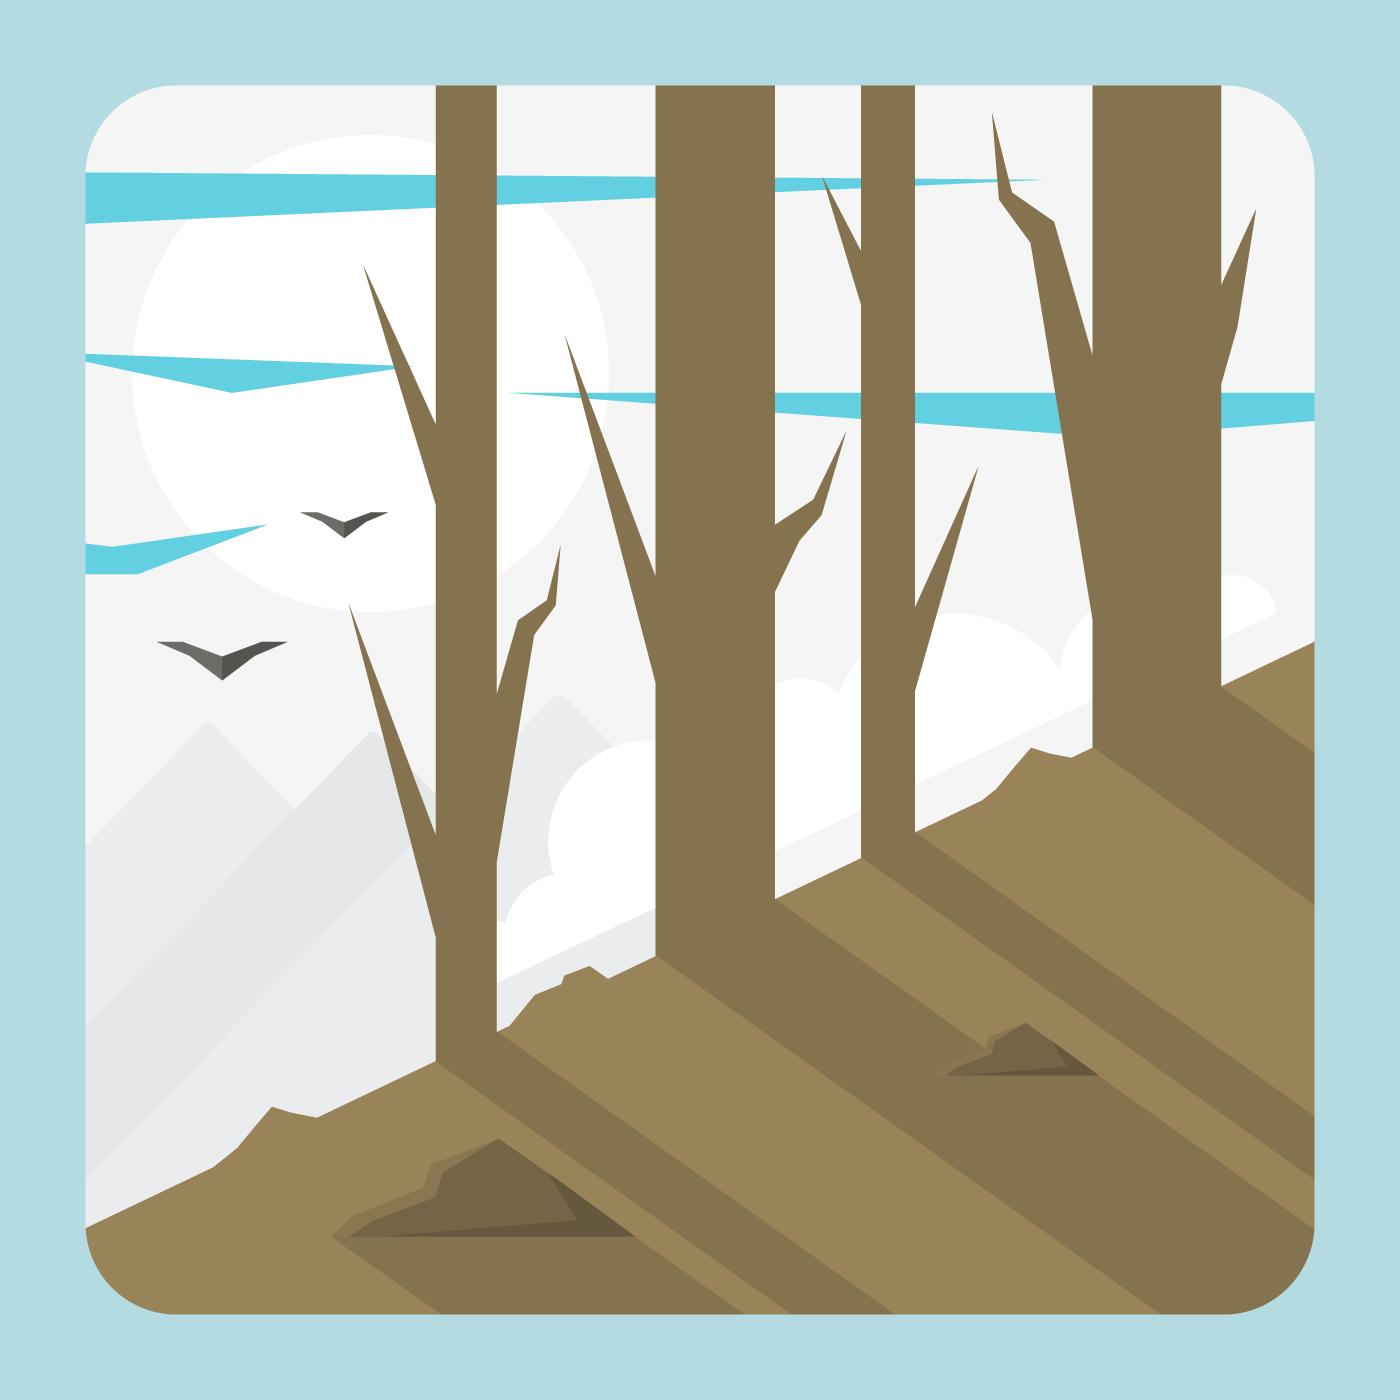 Landscape Illustration Vector Free: Download Free Vector Art, Stock